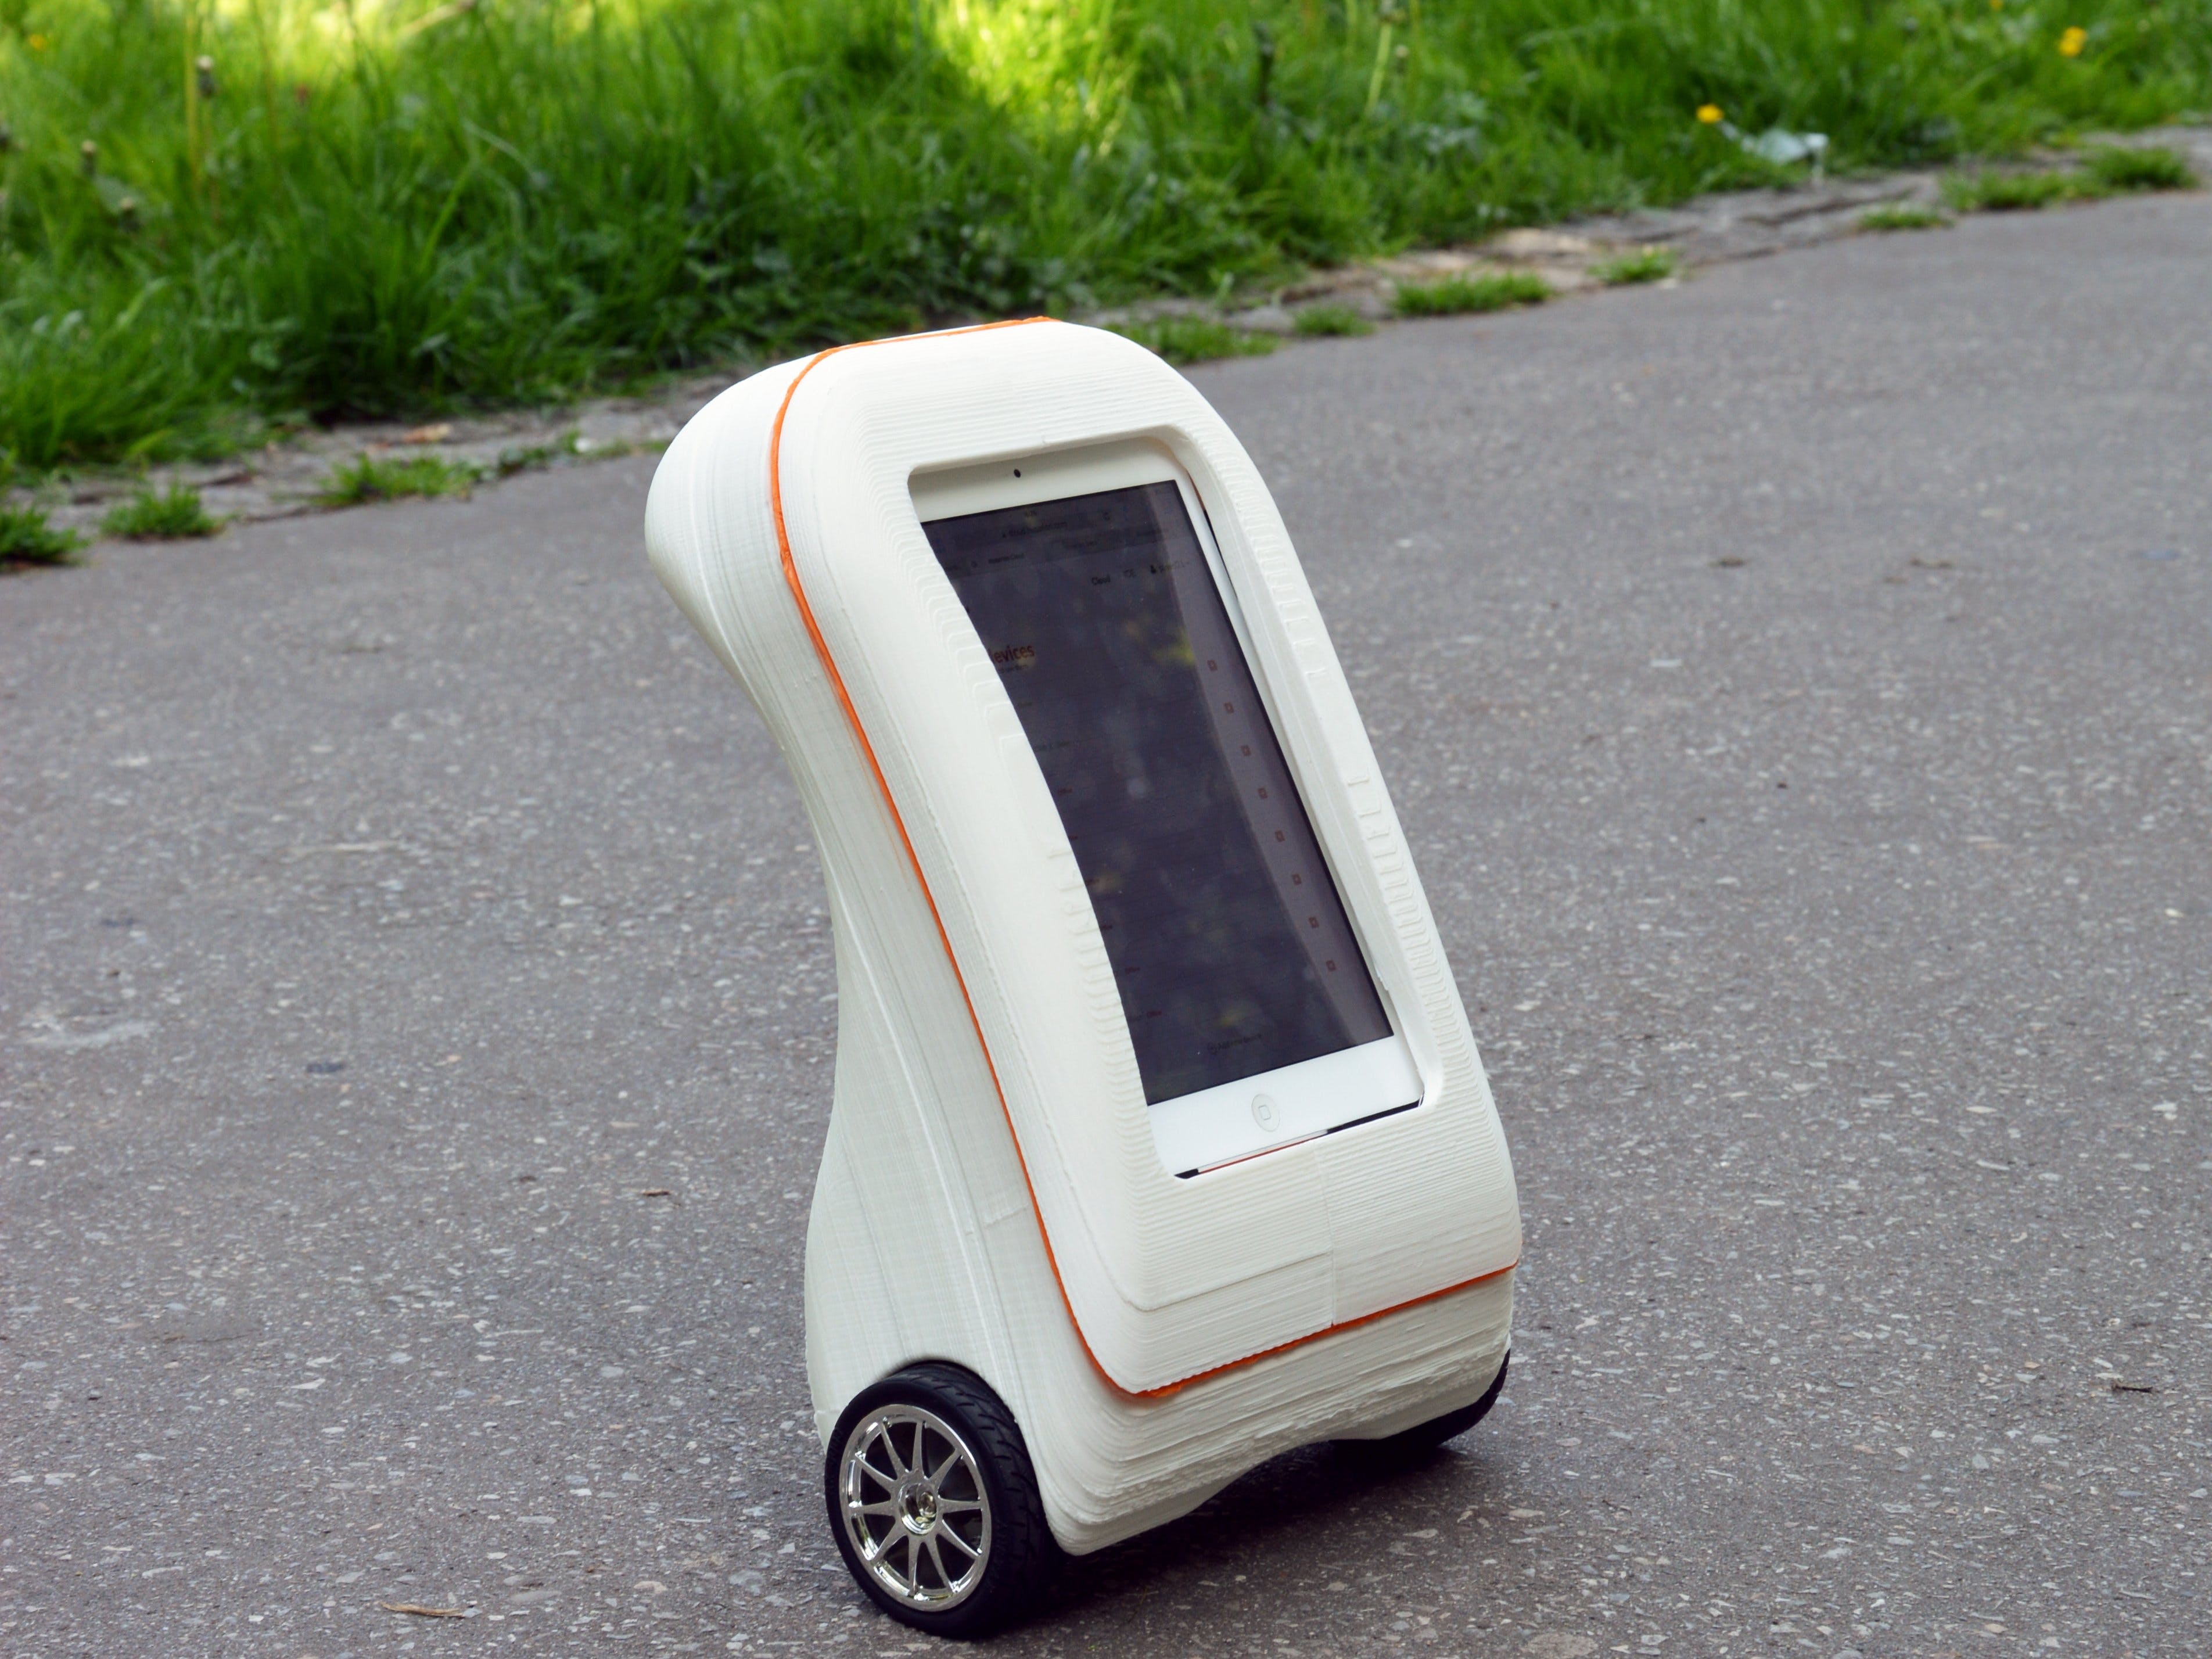 3D-Printed, Internet-Controlled, Self-Balancing FPV Robot